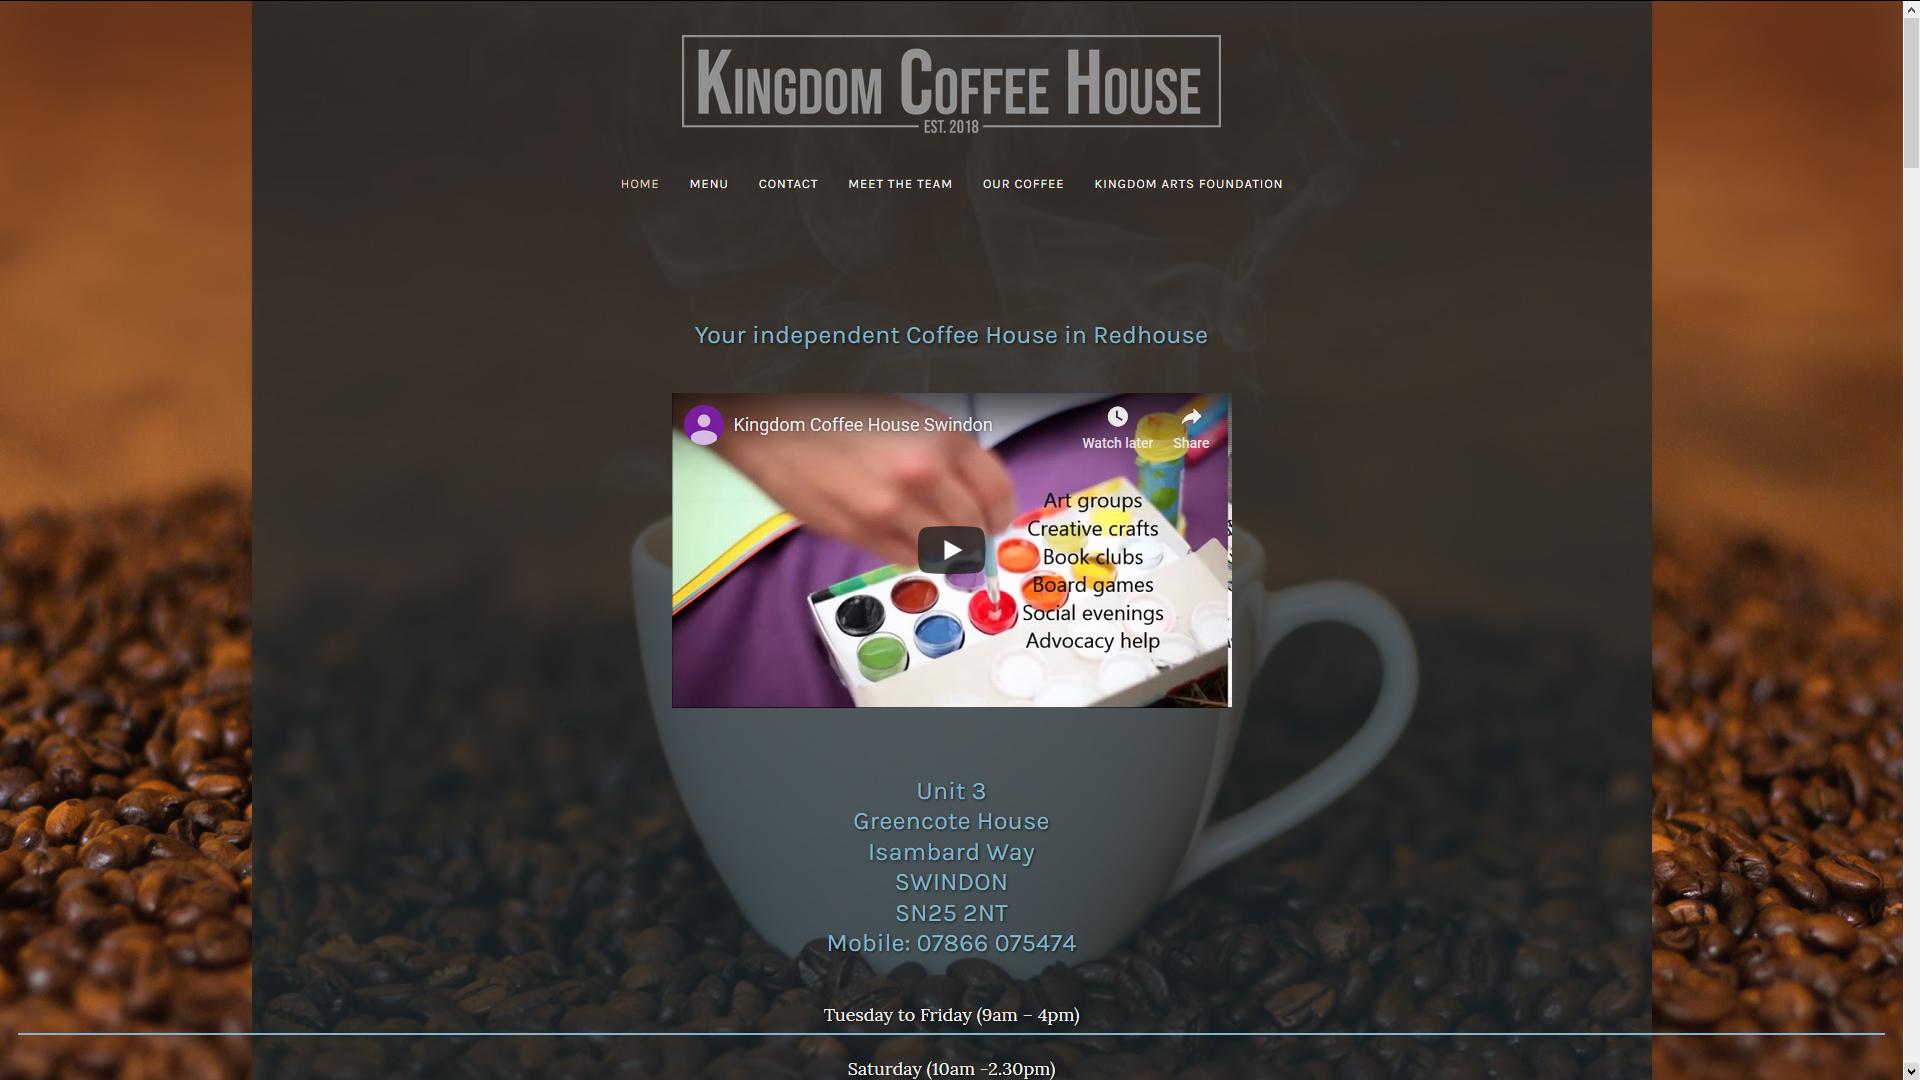 Kingdomn Coffee House